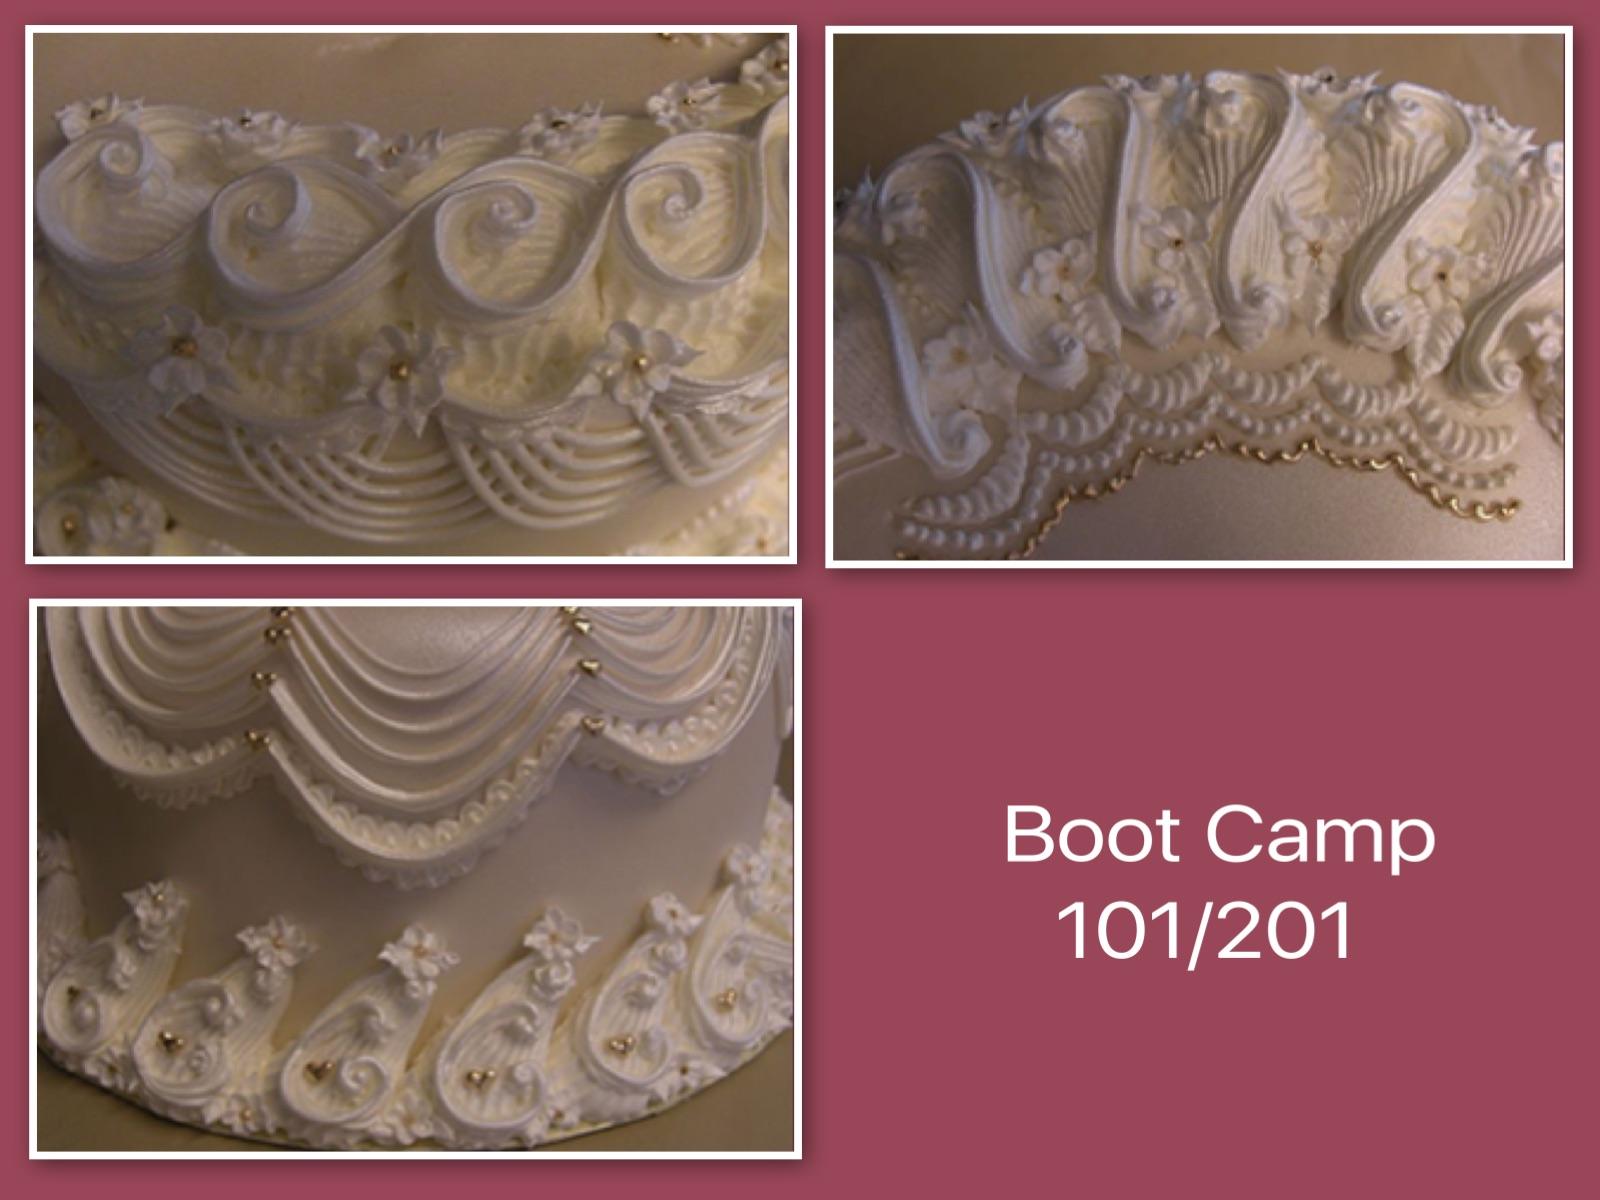 BootCamp101201.jpg